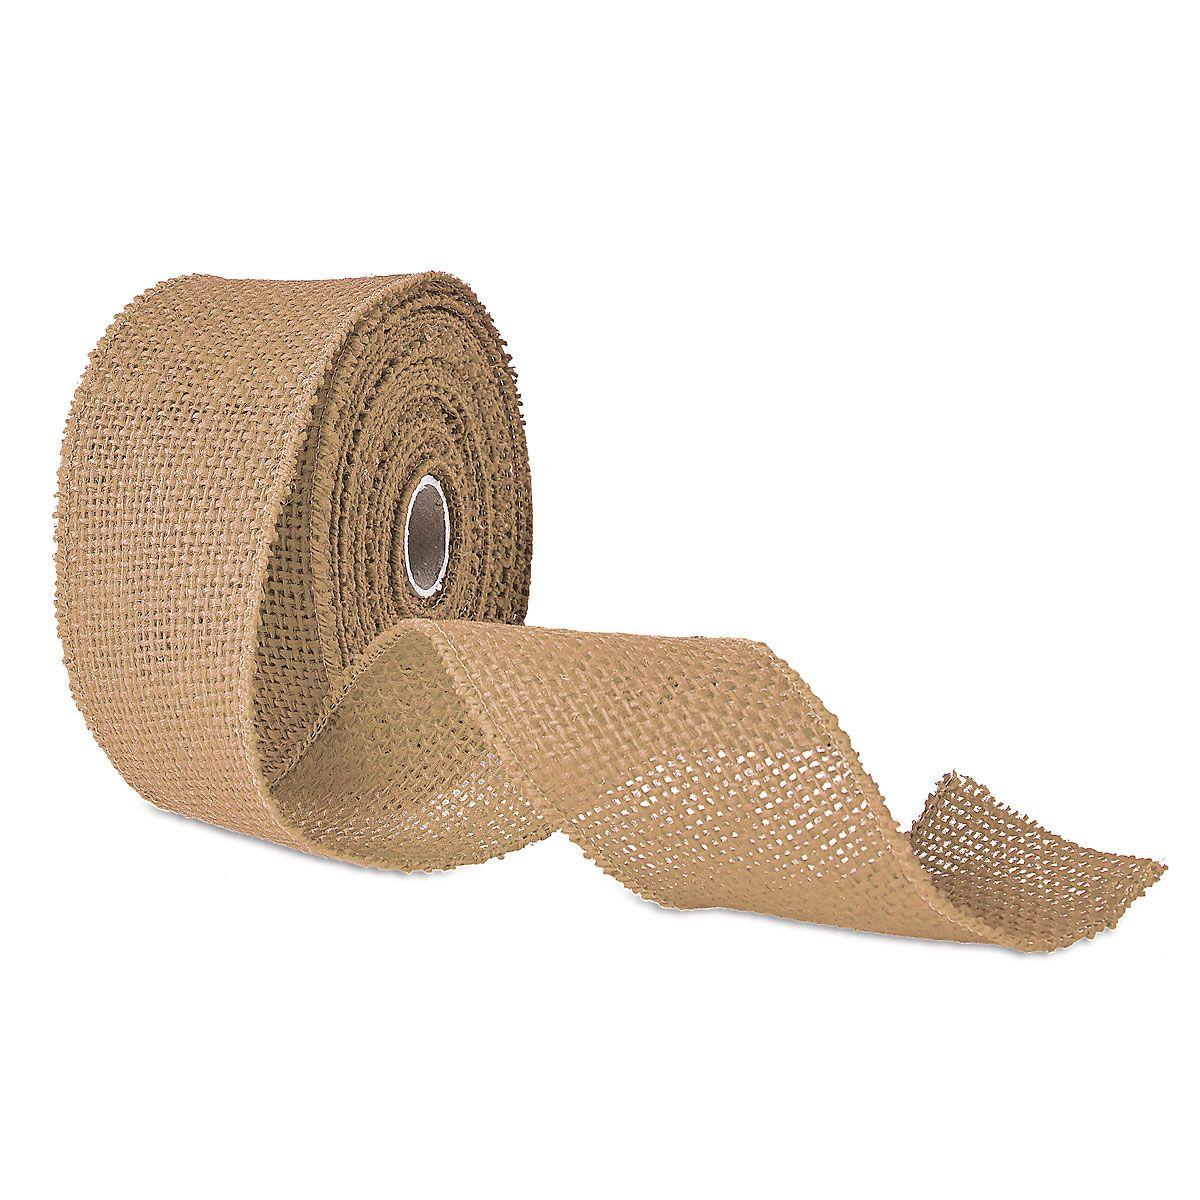 Wired Burlap Ribbon Natural